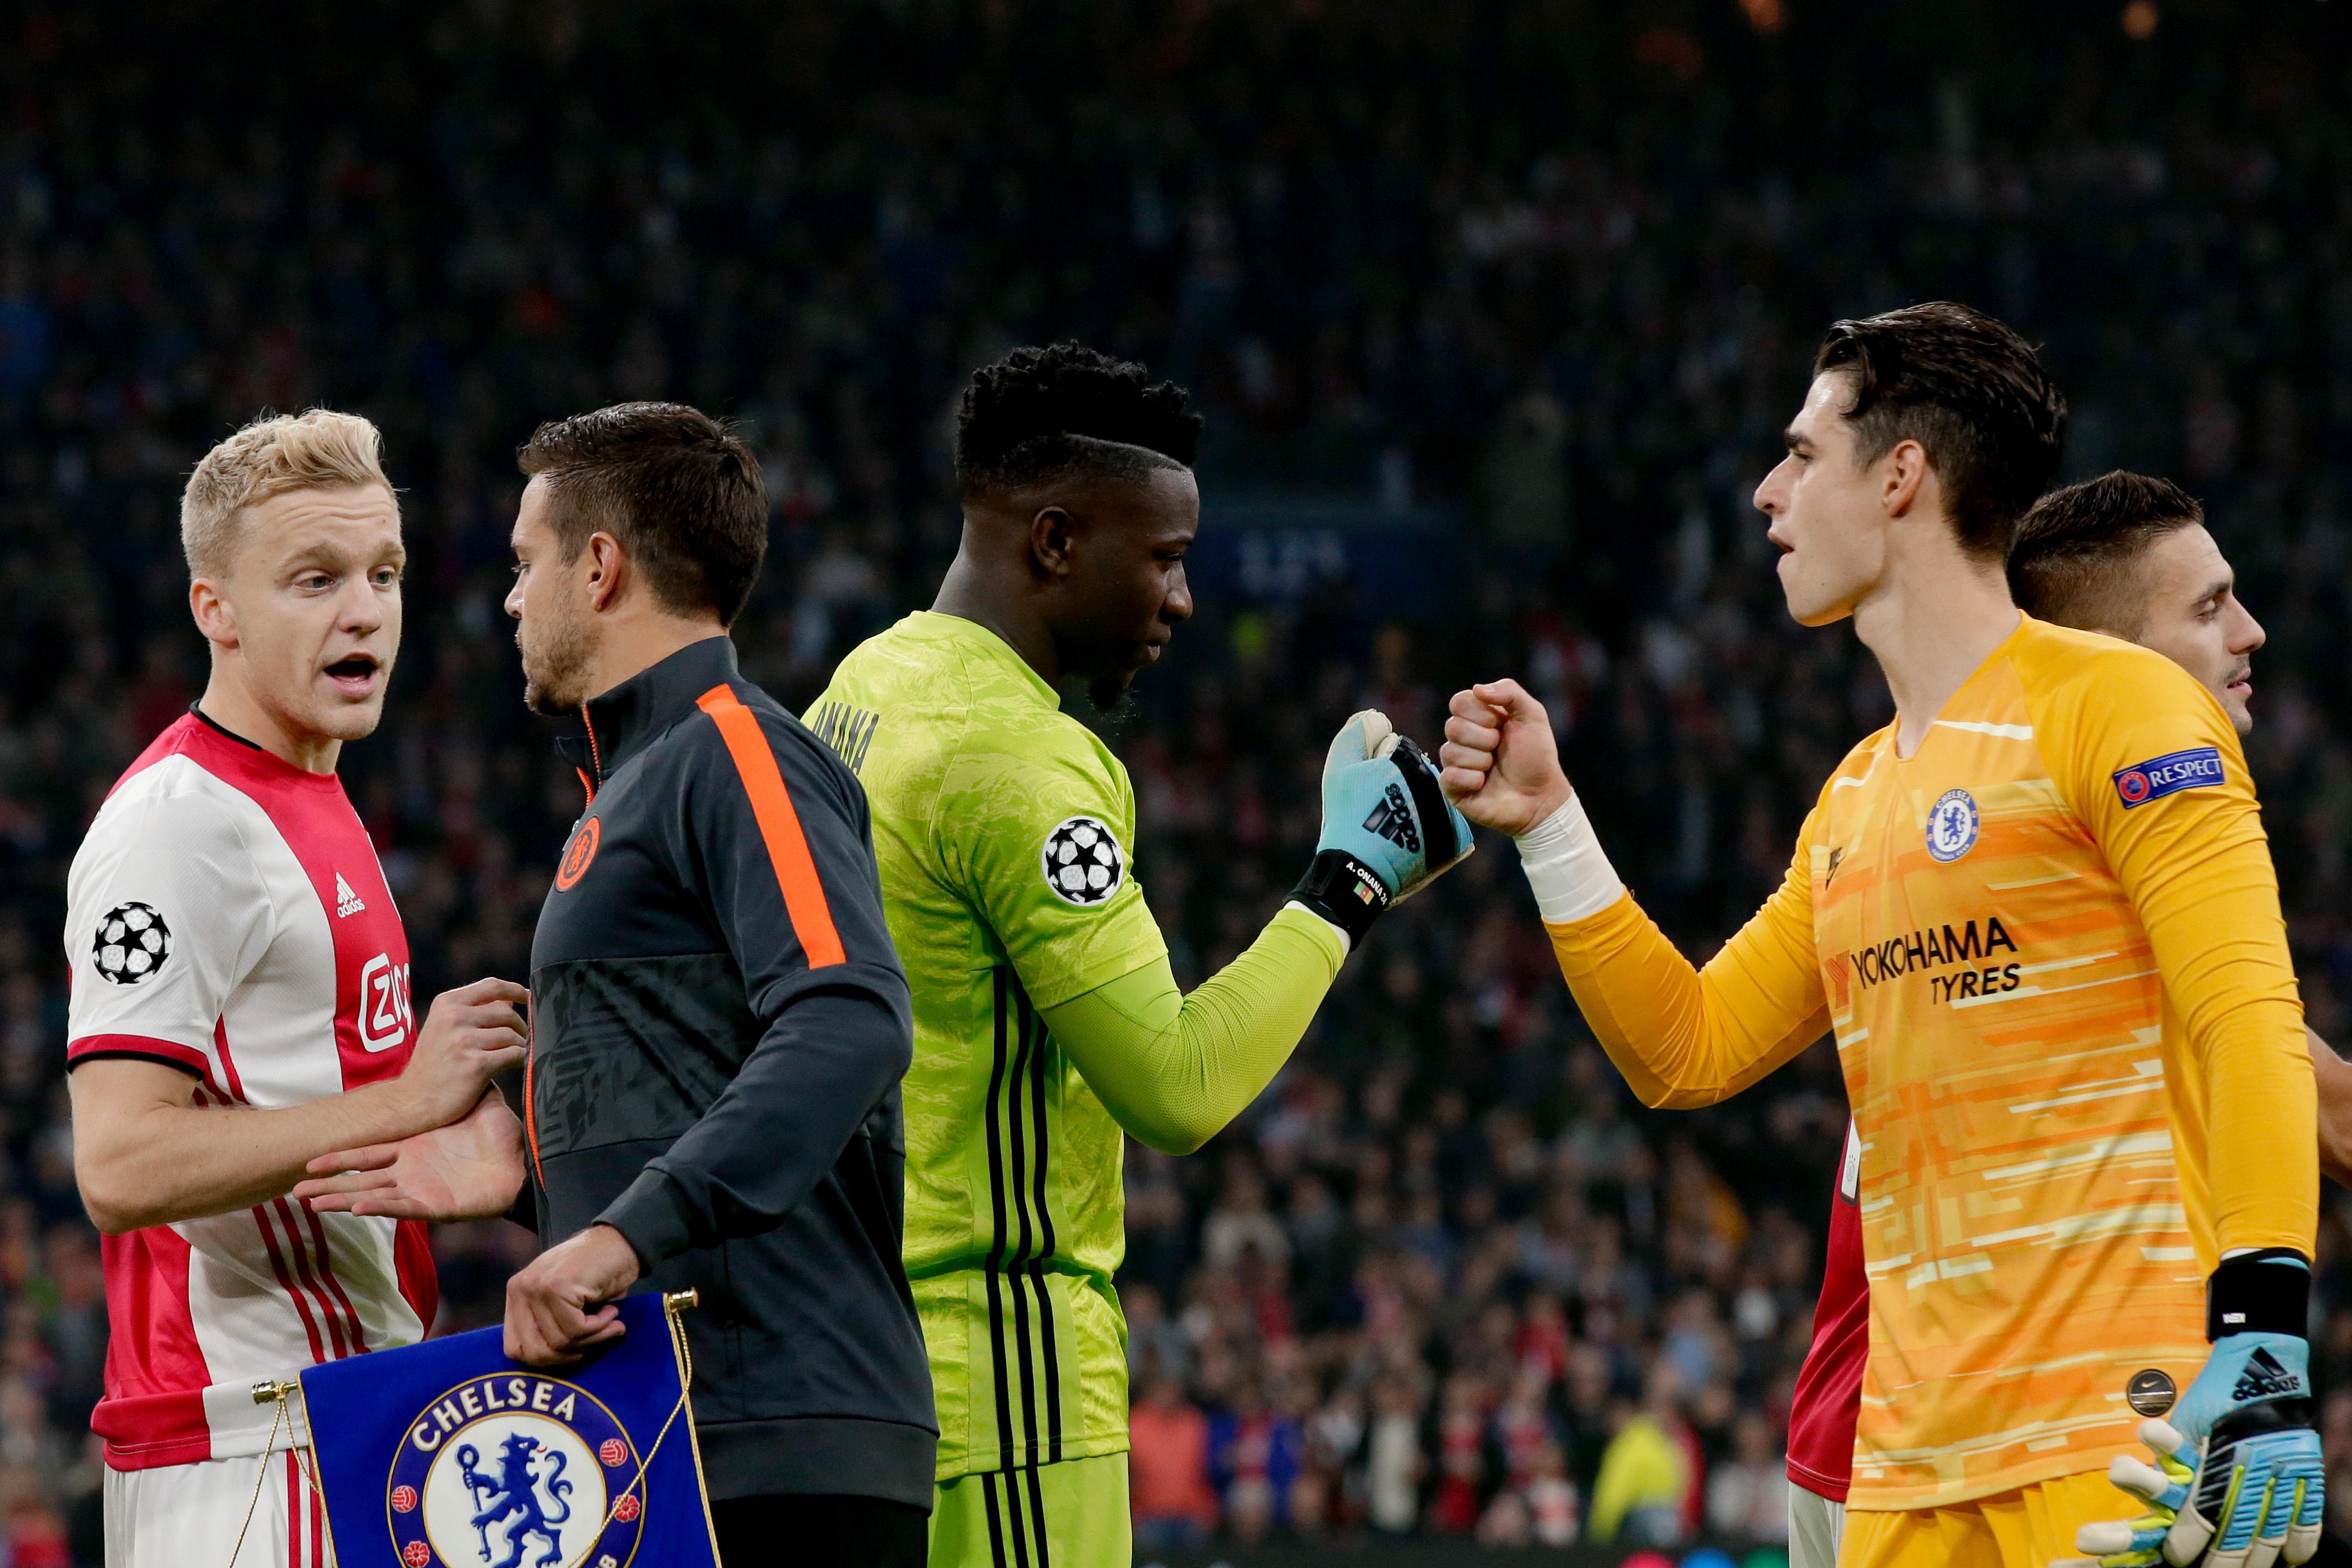 Ajax v Chelsea - UEFA Champions League